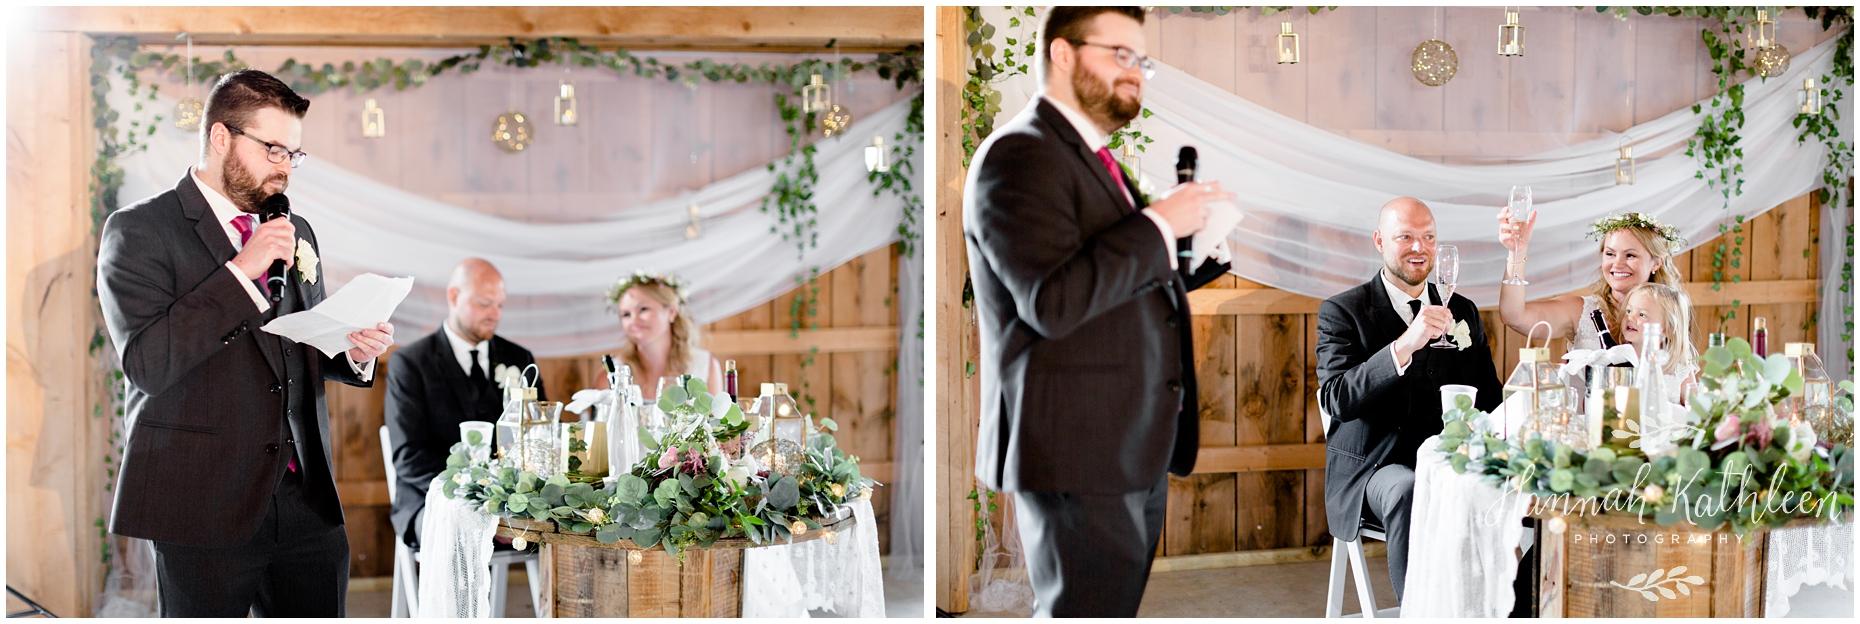 chq-barn-lake-house-chautauqua-wedding-reception-photography-bride-groom-photographer